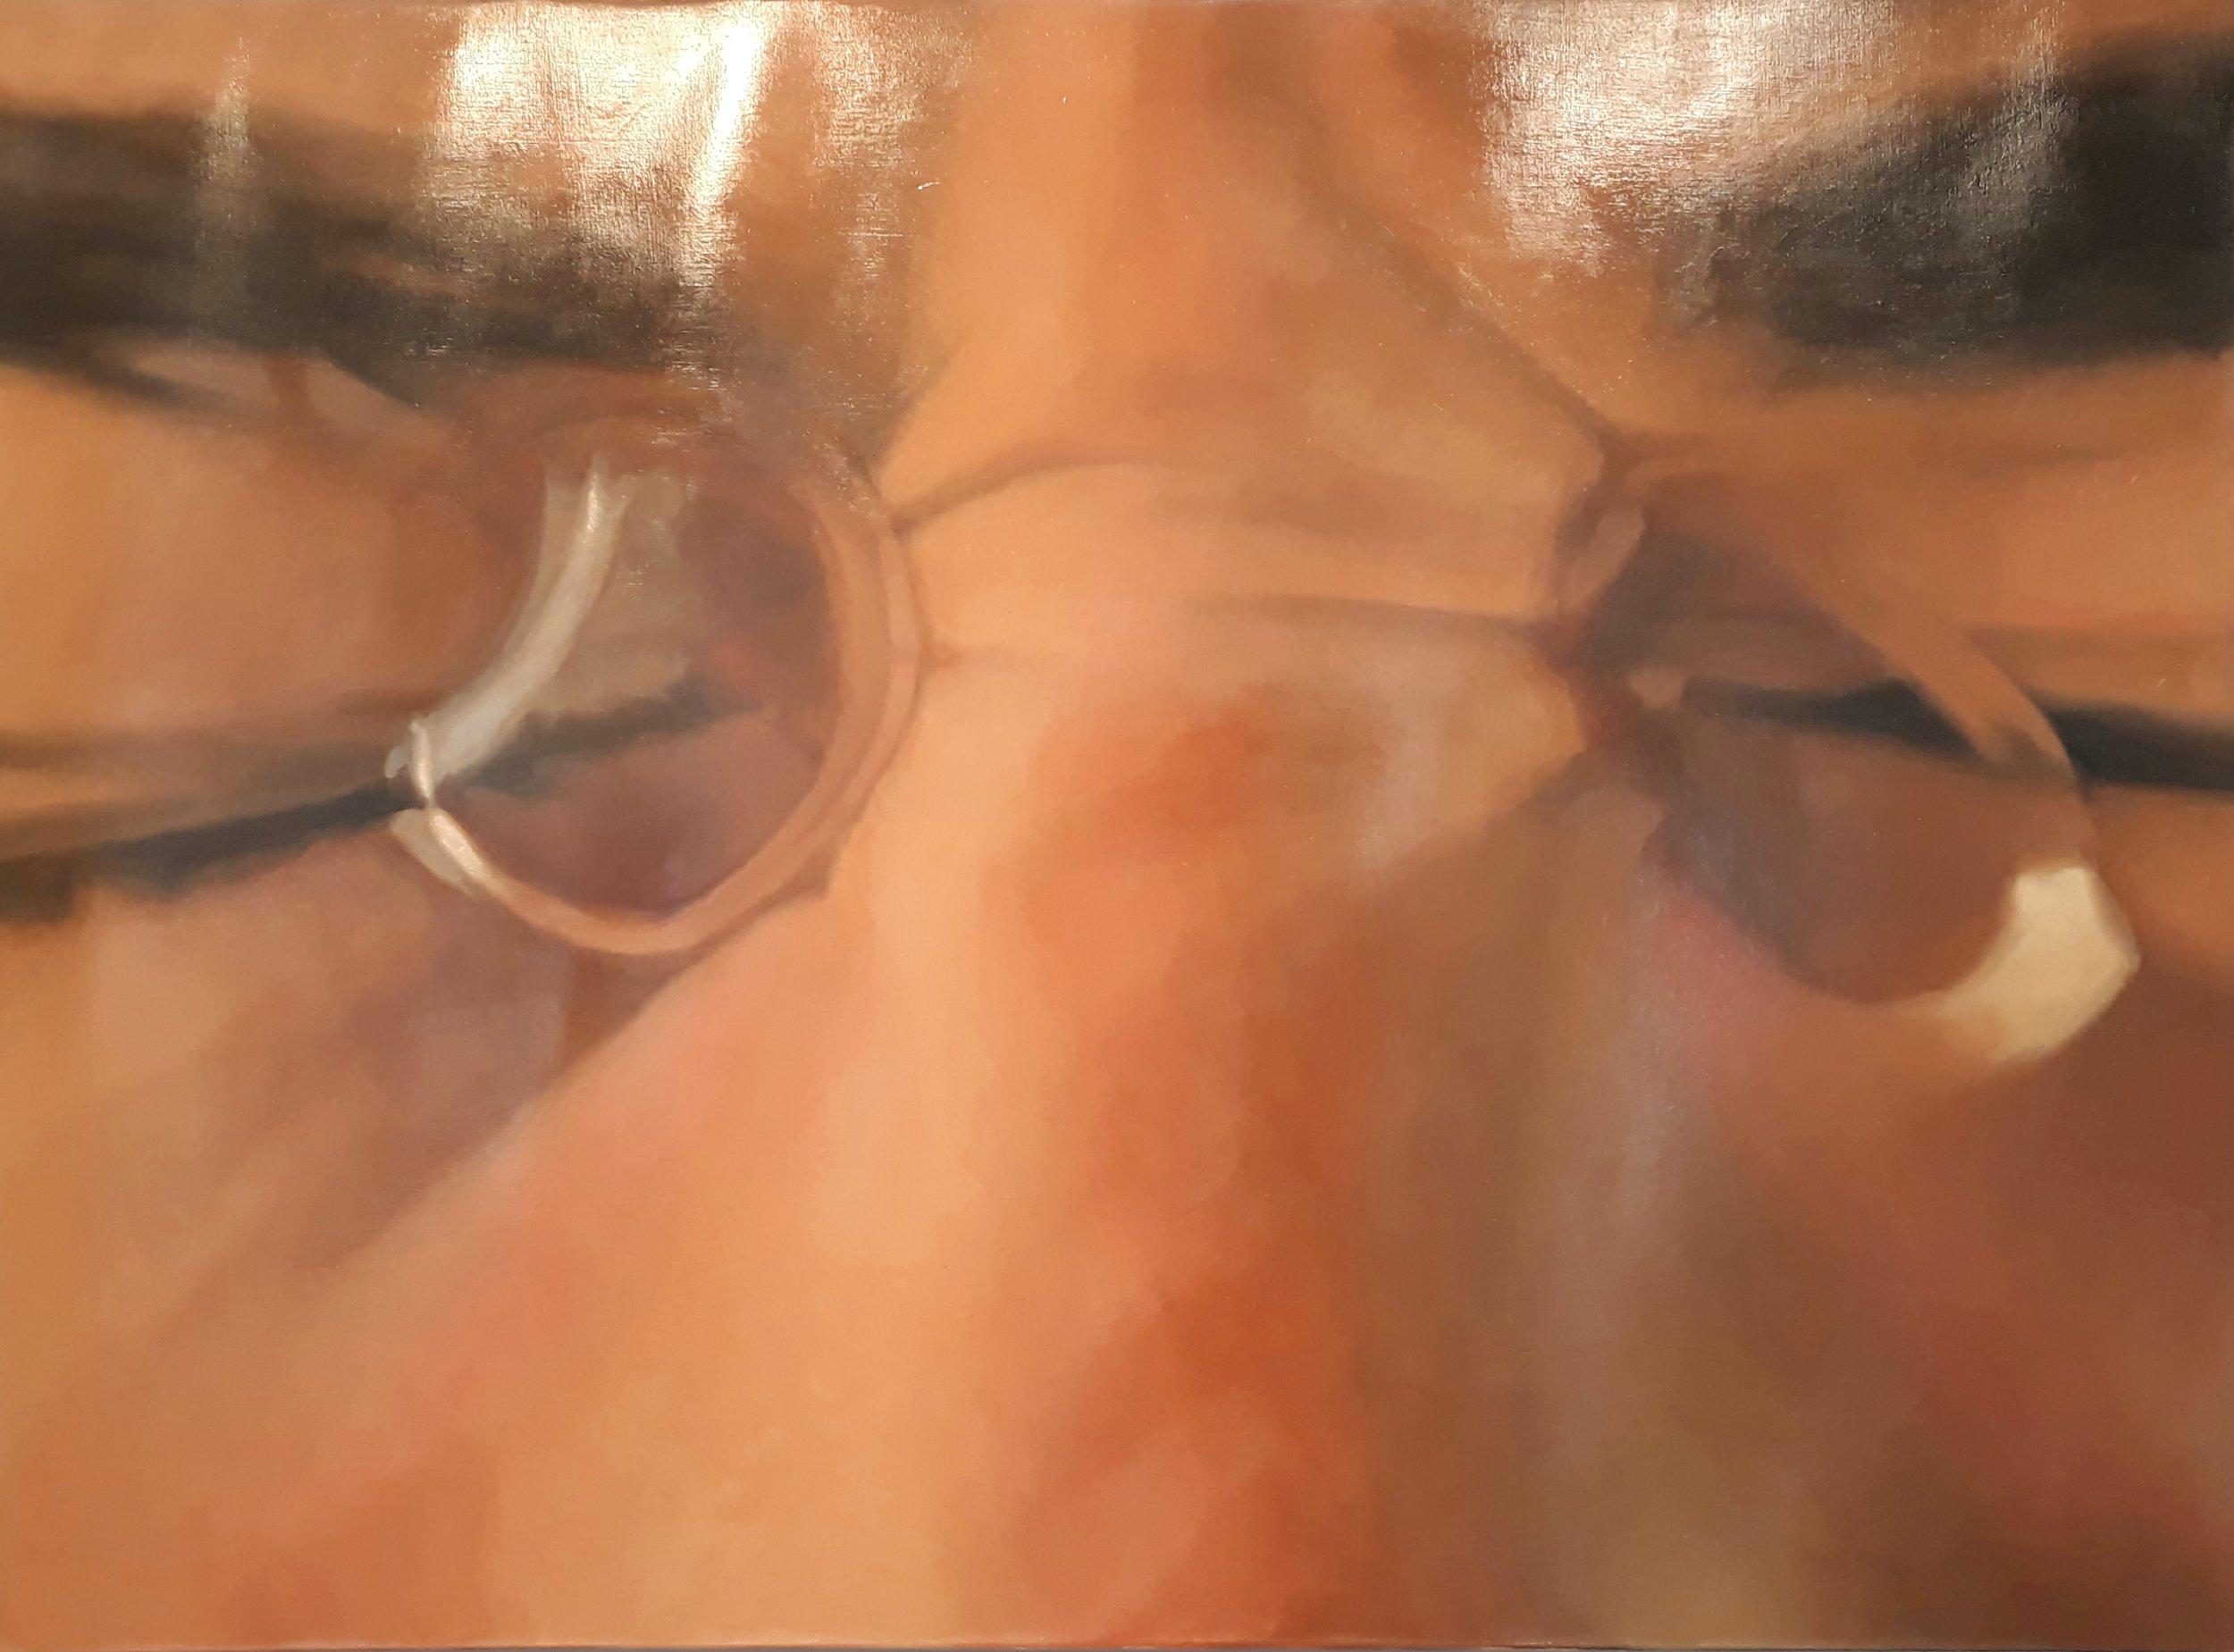 Sumersión 1 (2019) - 130 x 95 cm - Óleo sobre lienzo / Oil  painting on canvas